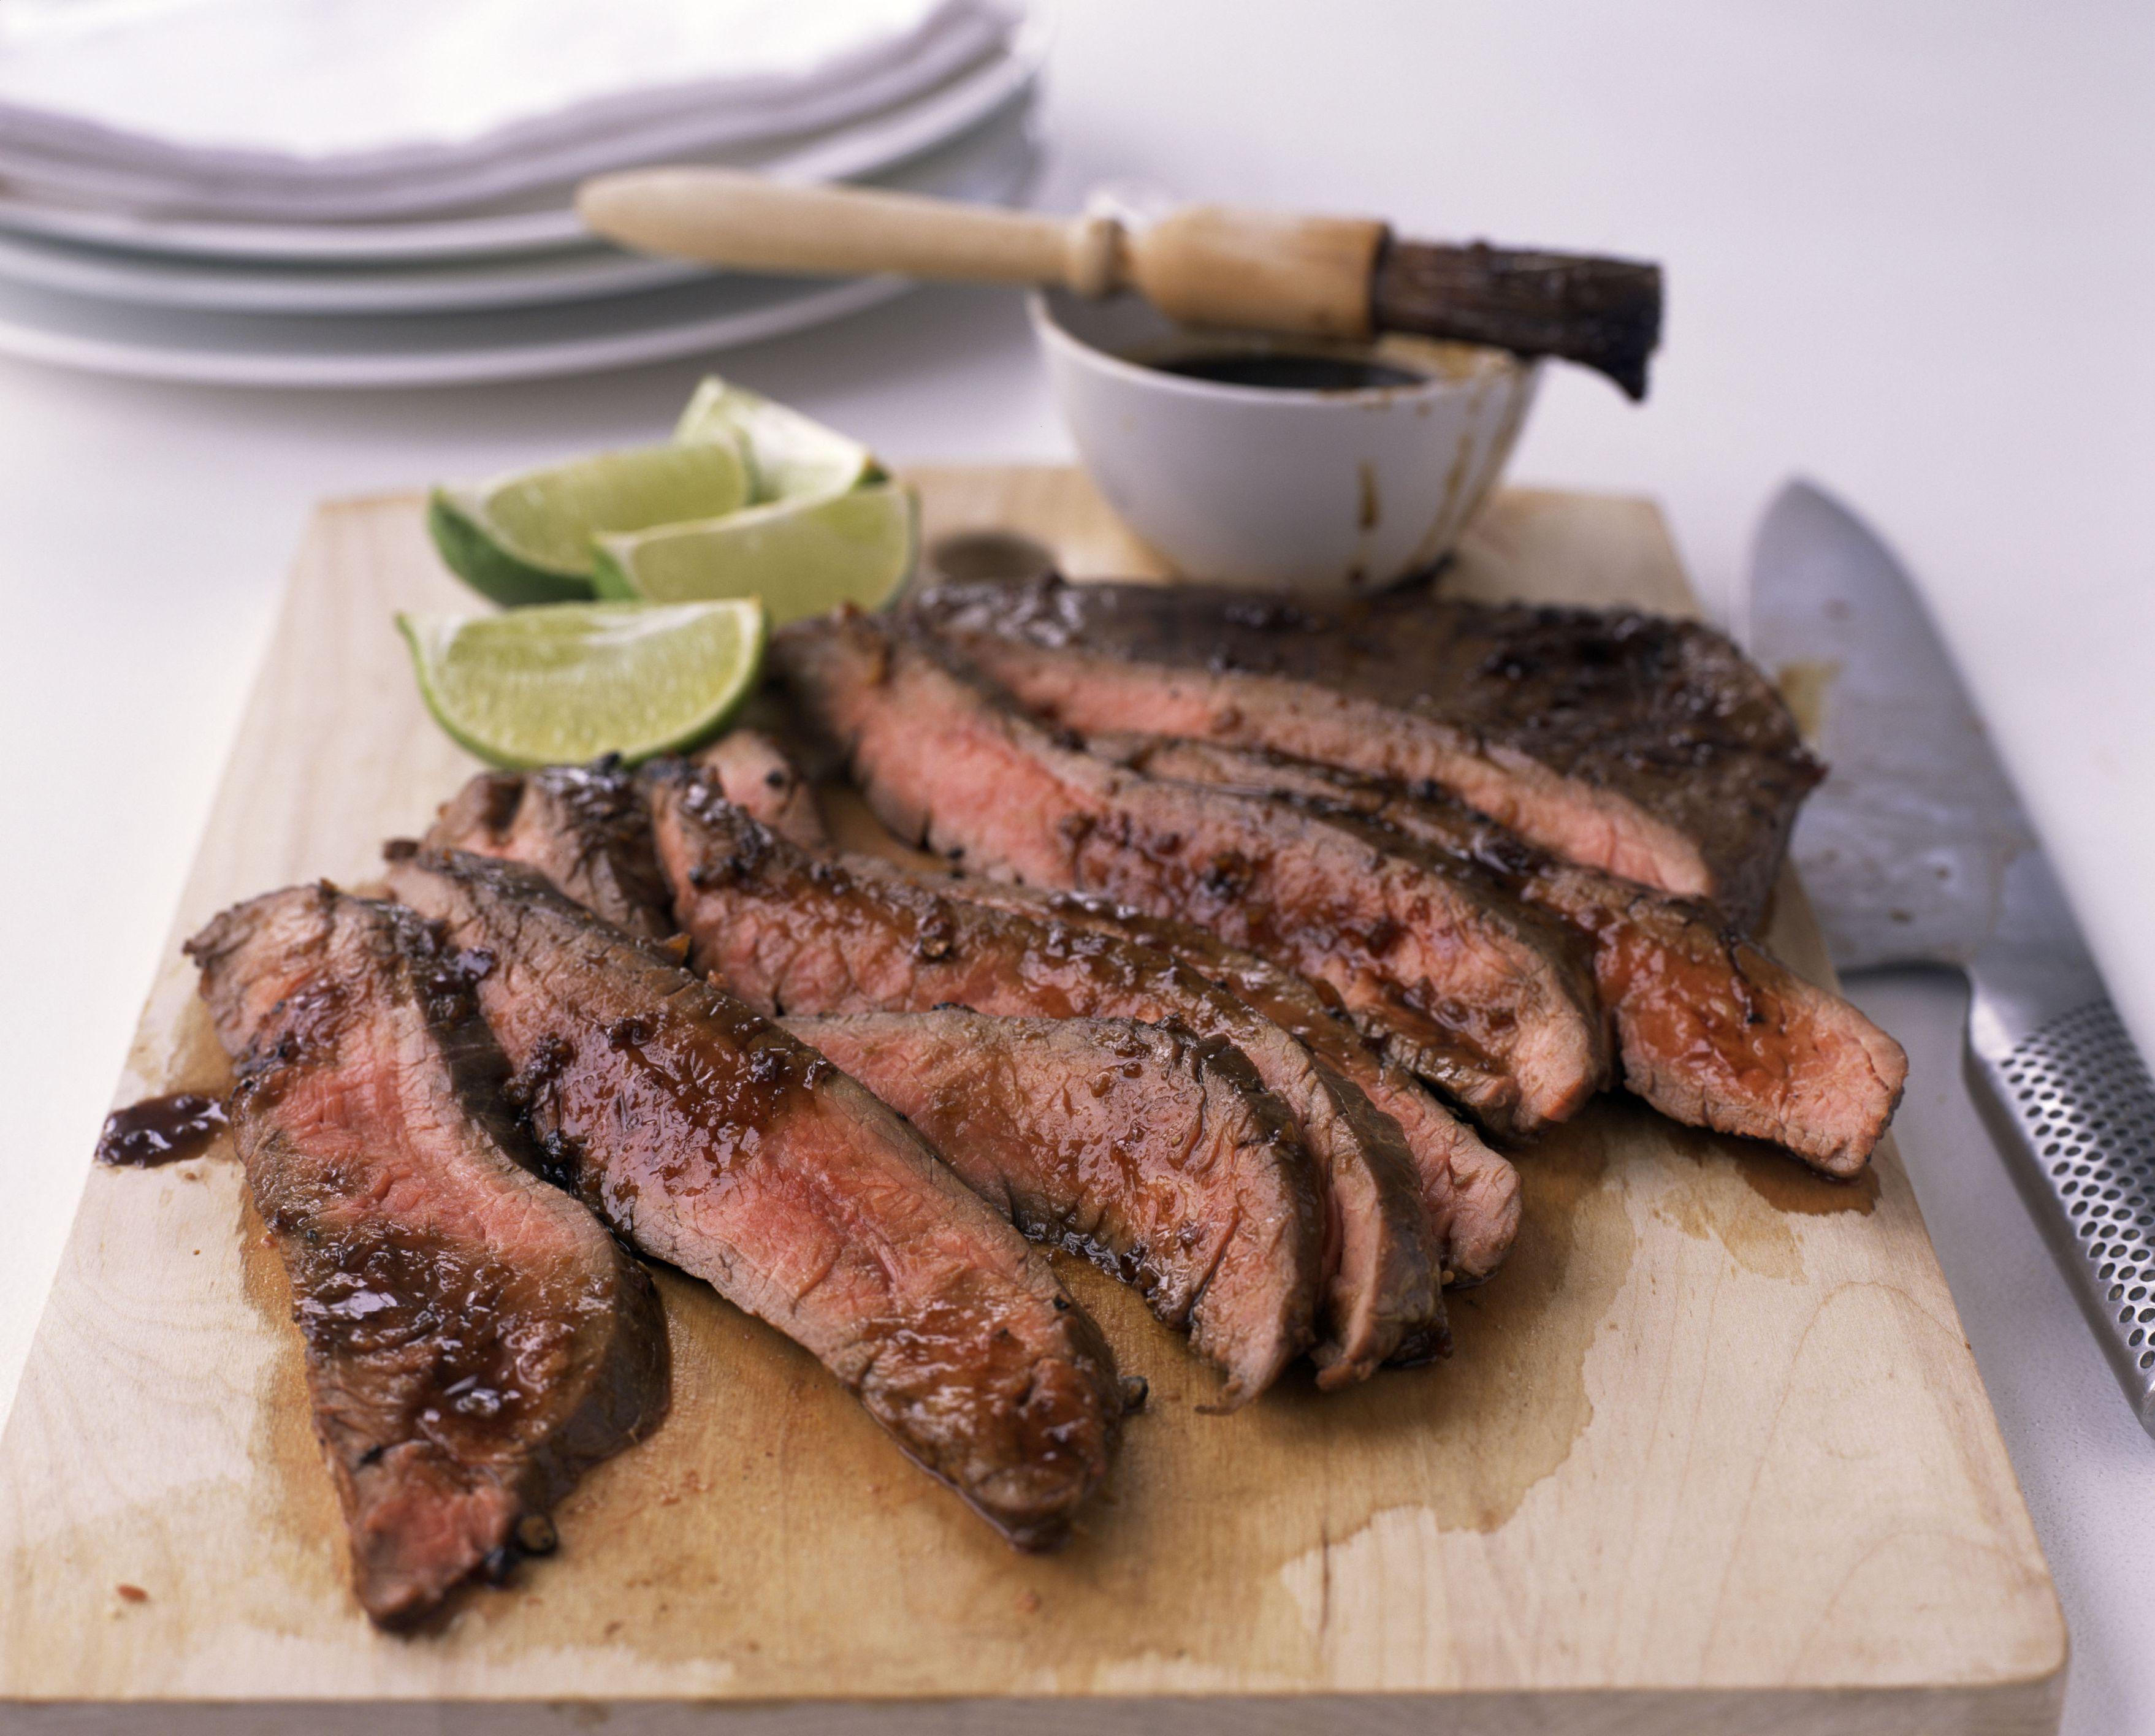 Sliced flank steak with au jus sauce